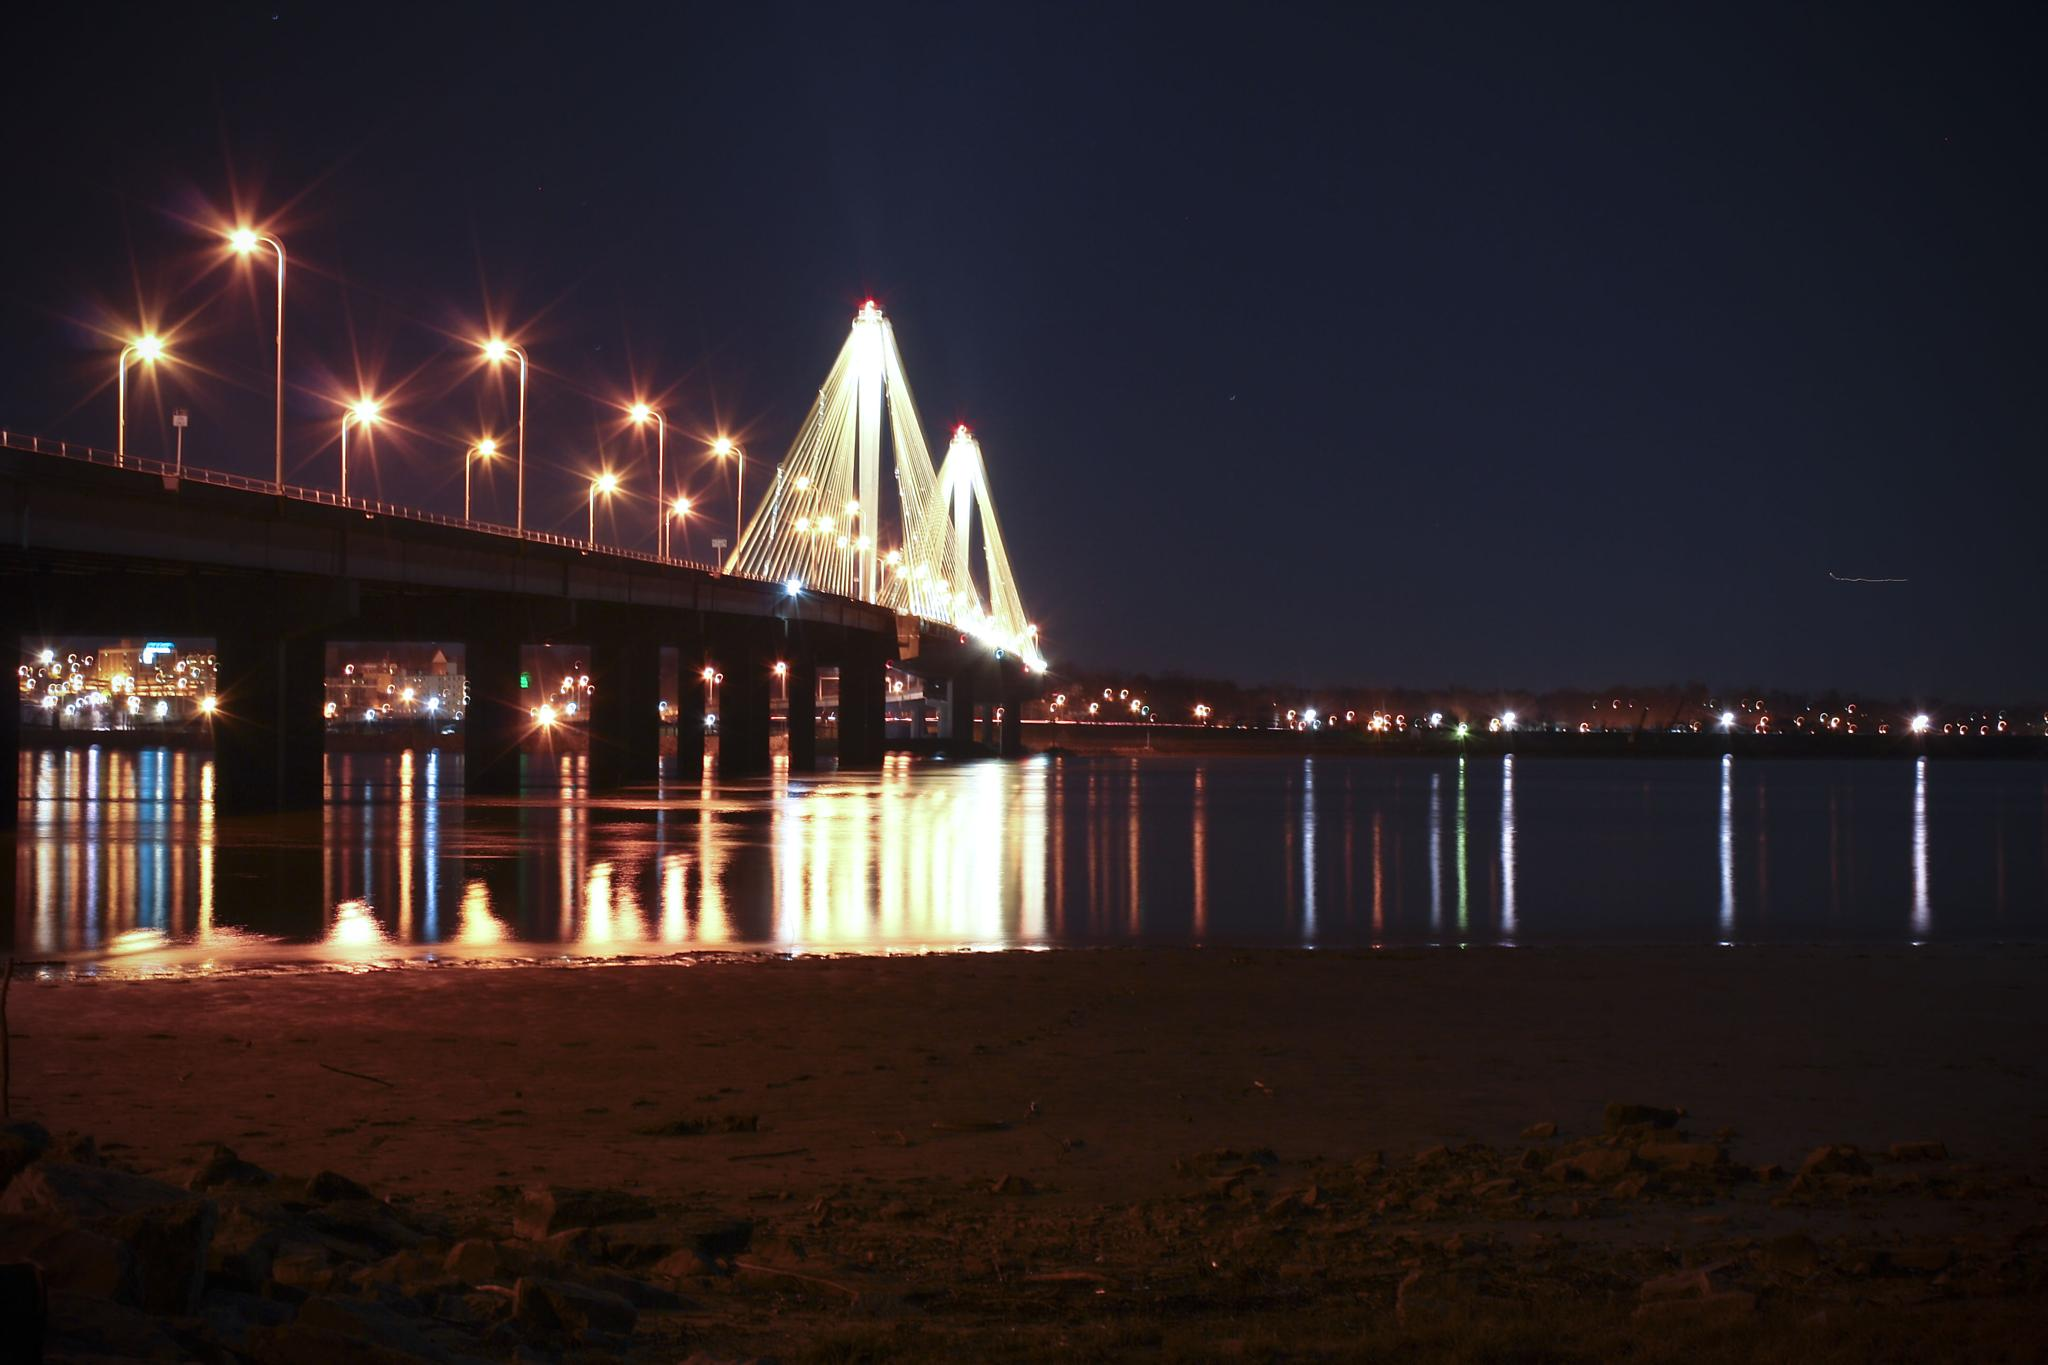 Clark Bridge by bowler58